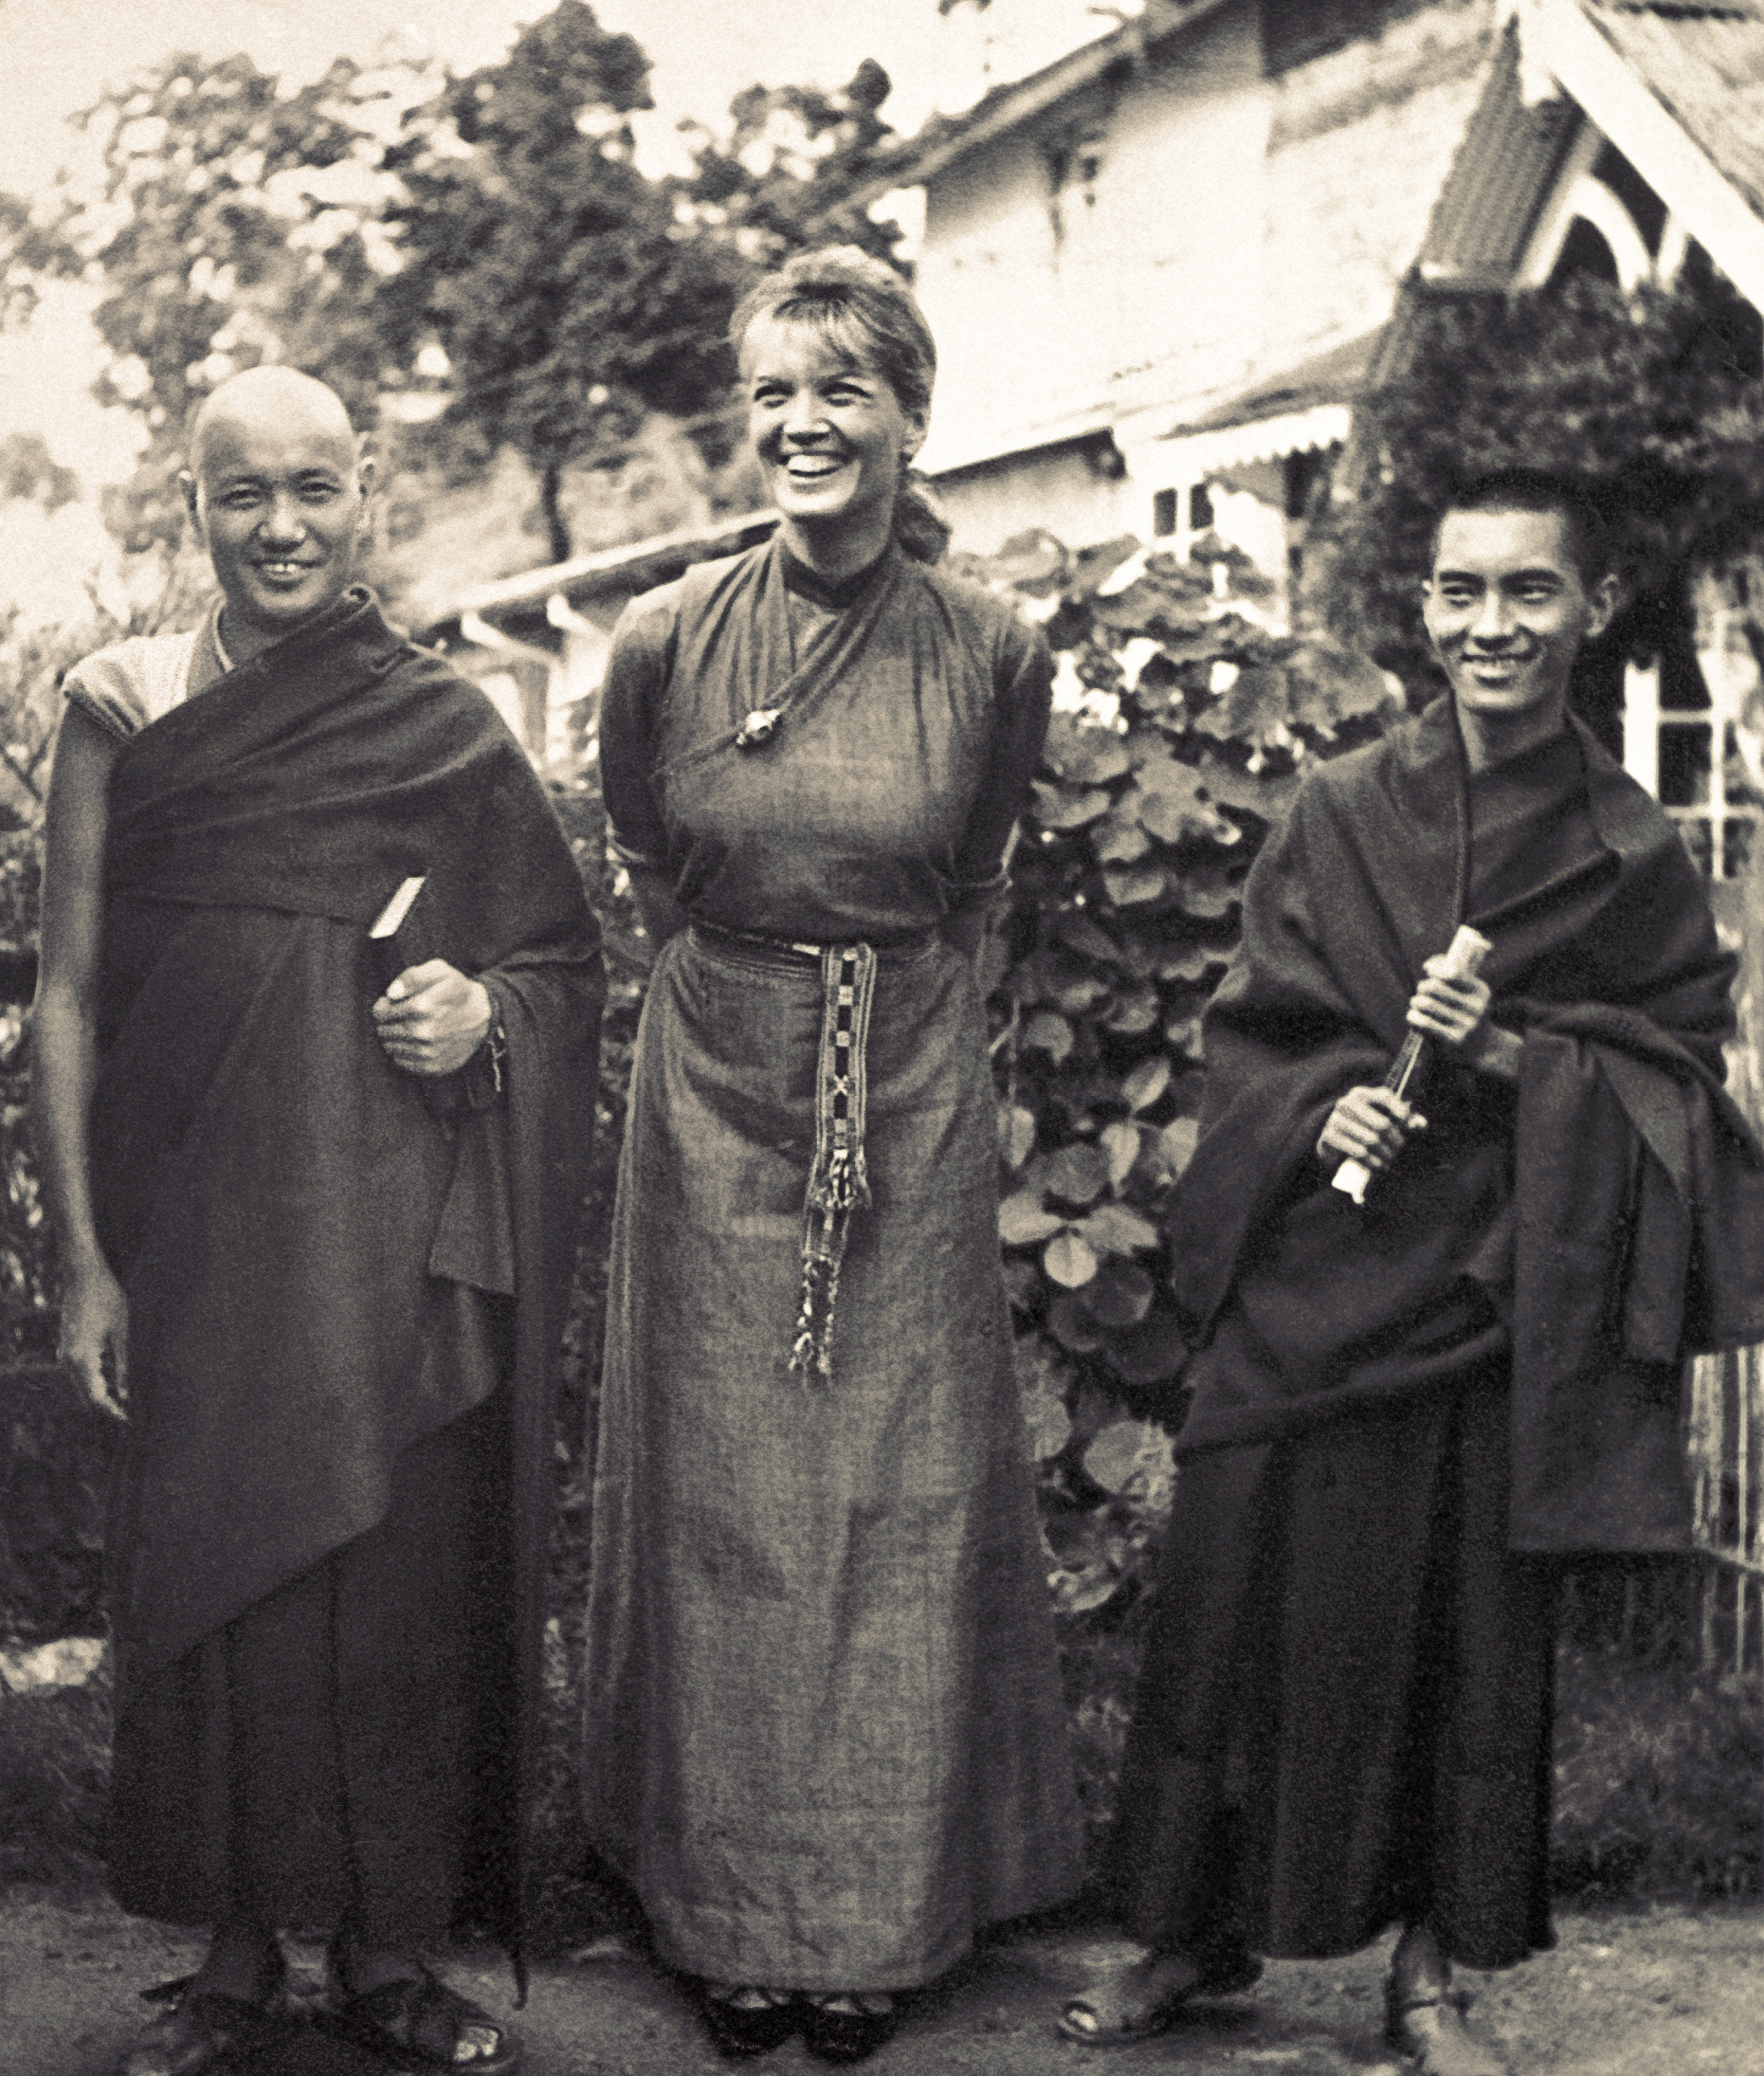 Lama Yeshe and Lama Zopa Rinpoche with their first Western student, Zina Rachevsky, Darjeeling 1970. (Photo LYWA)